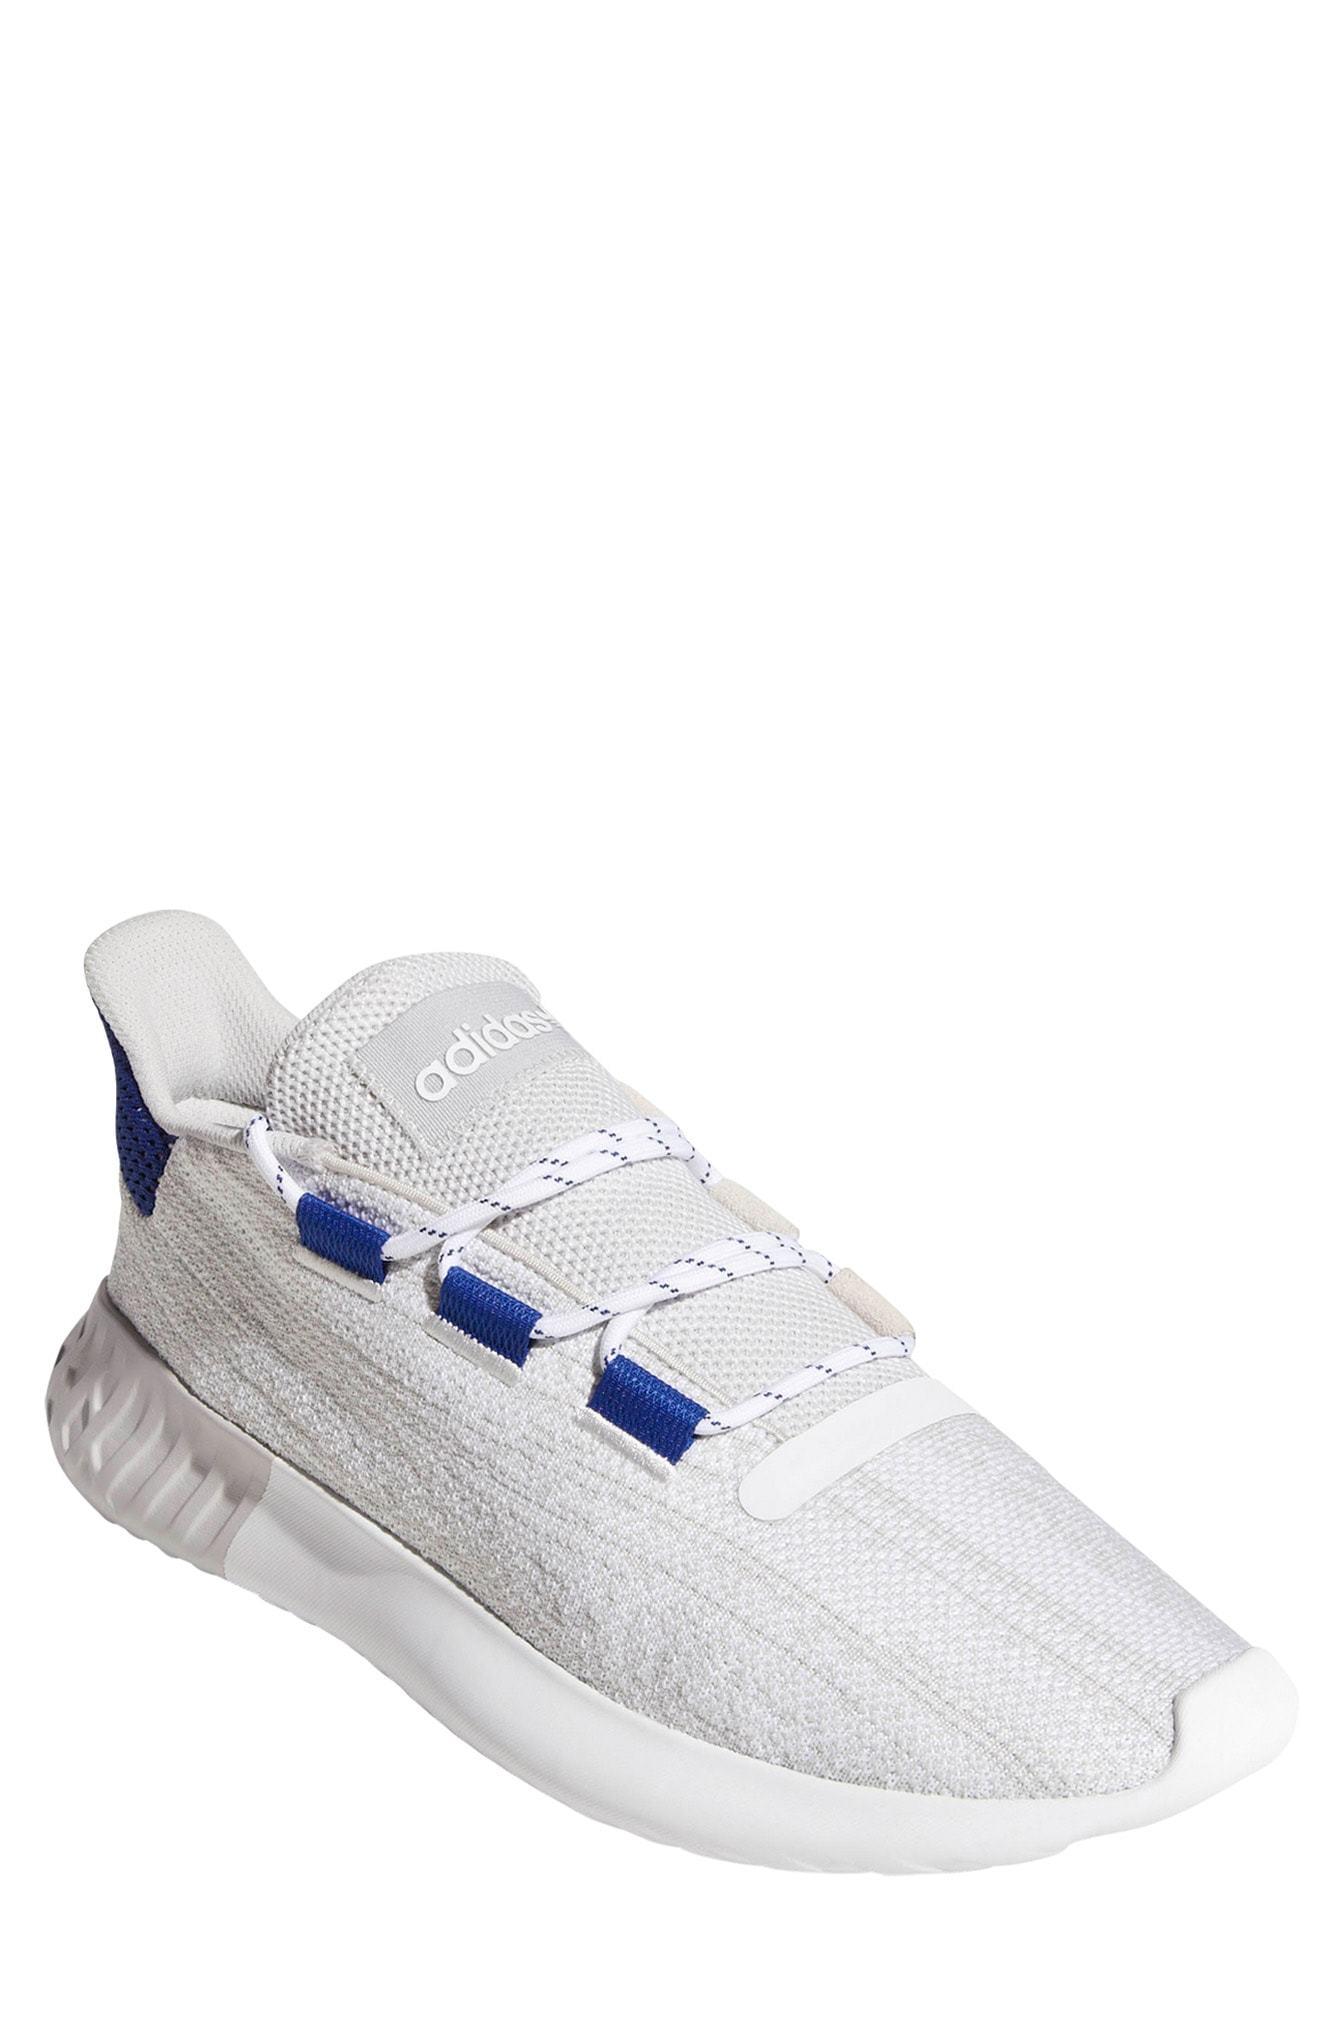 6b4d664cab72 ... White Athletic Shoes adidas Tubular Dusk Primeknit Sneaker